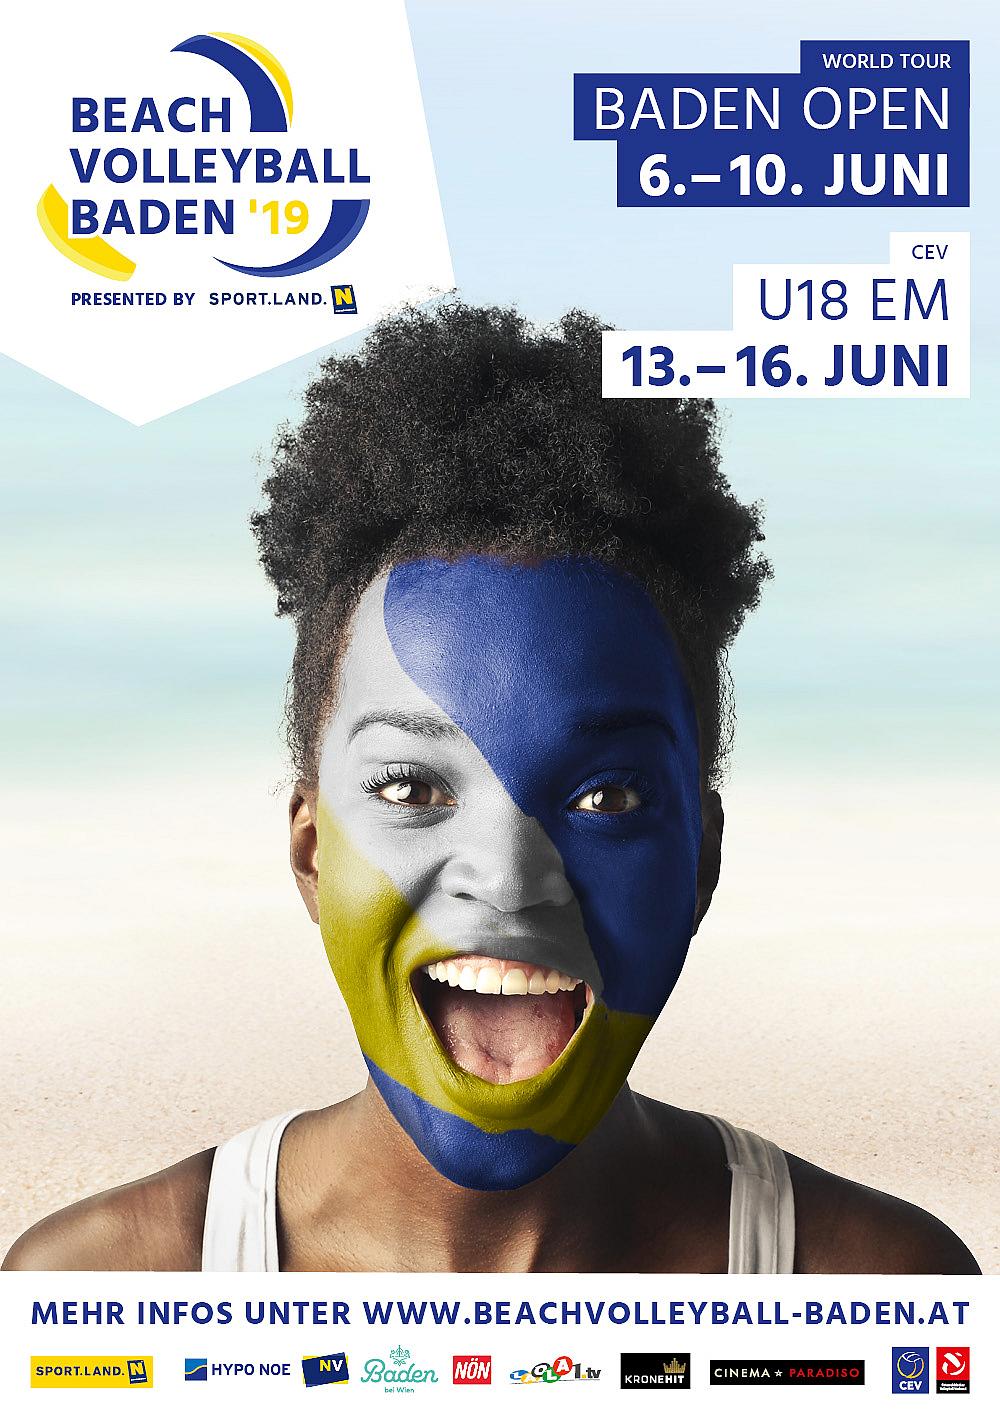 CEV U18 European Championships & FIVB Baden Open - FOTO © VISION 05